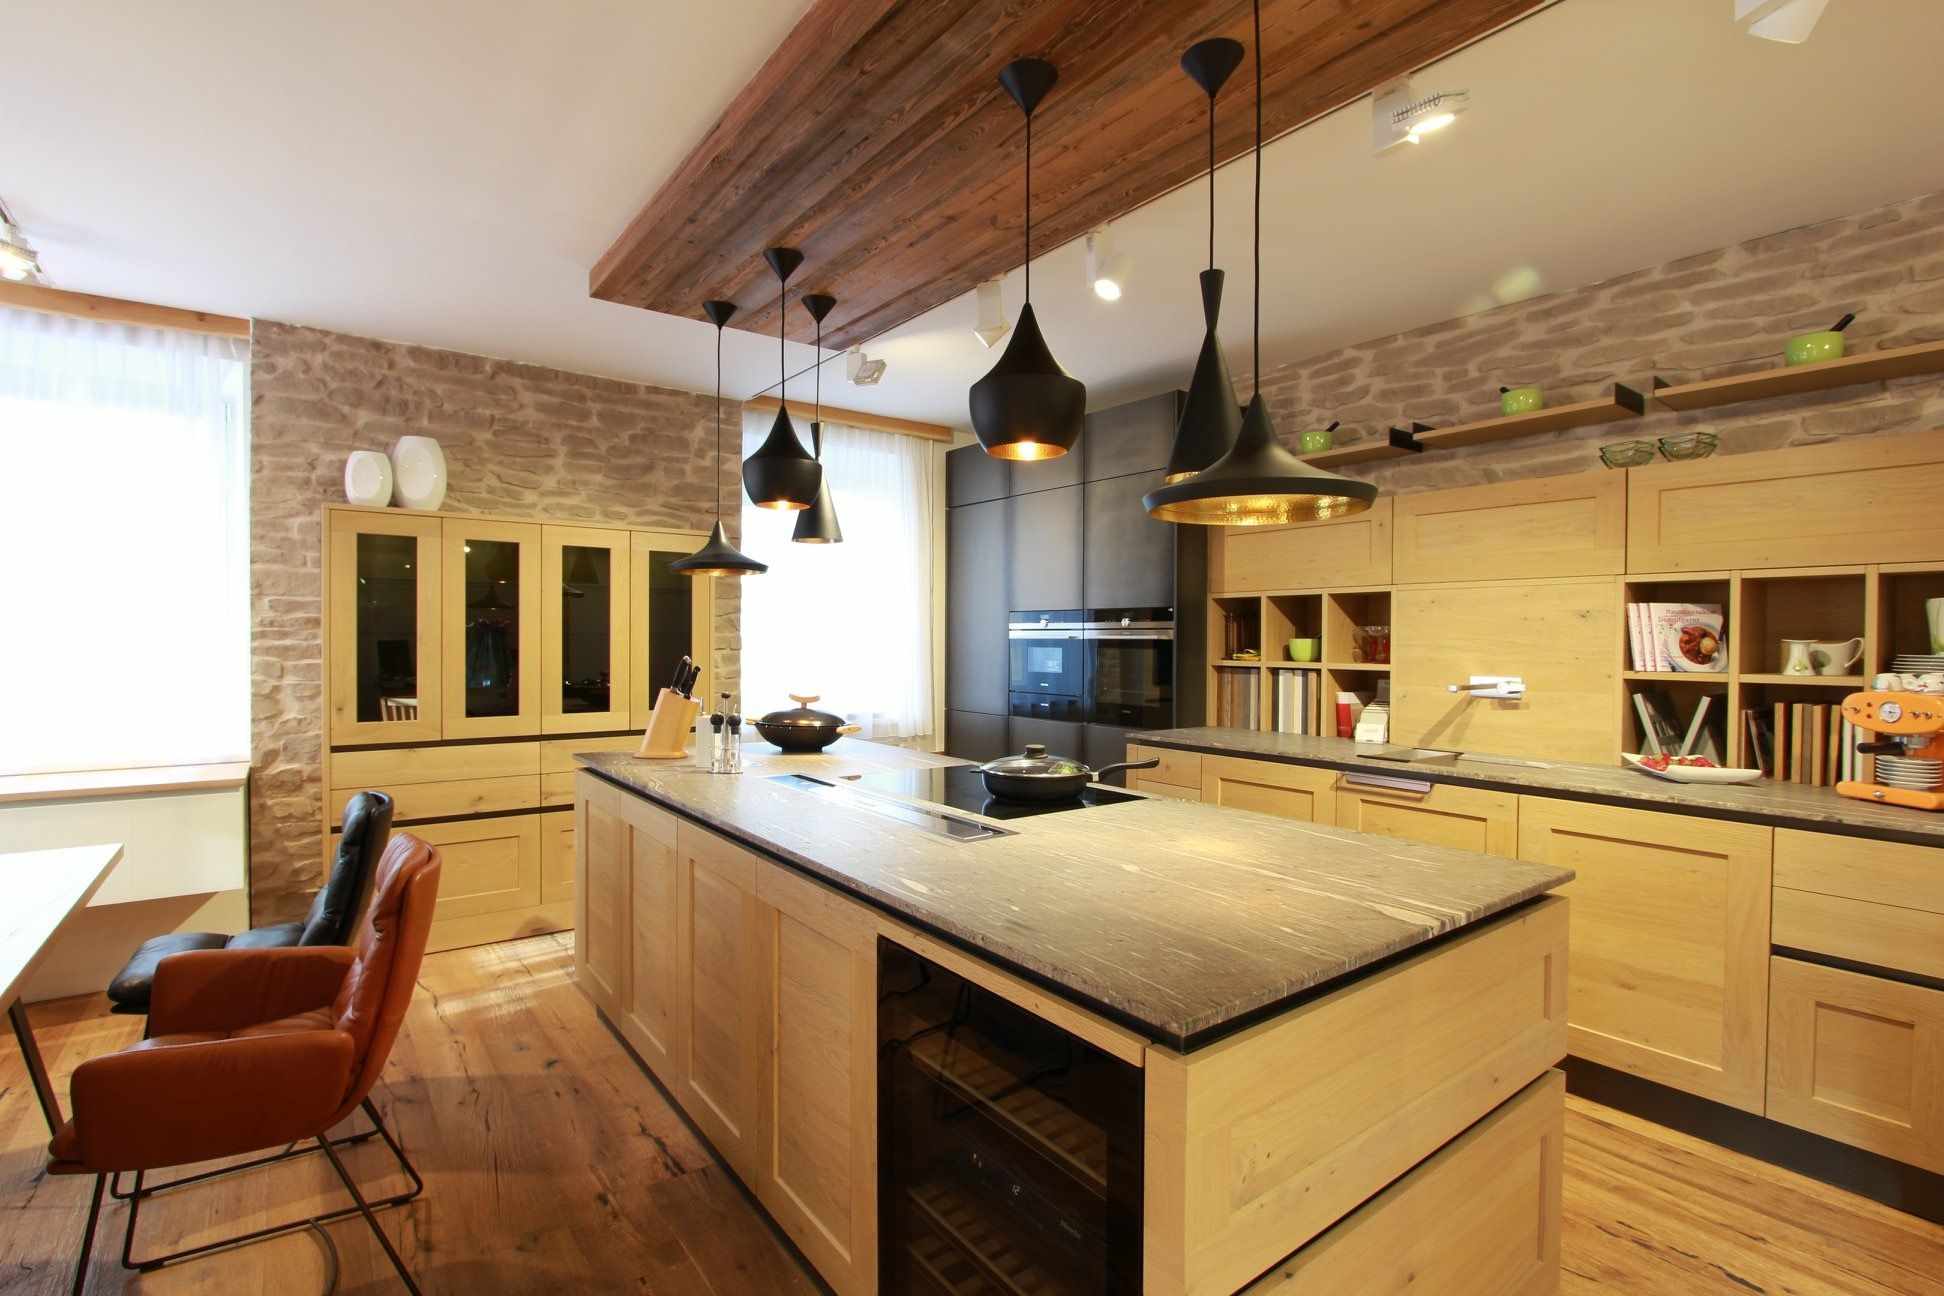 k che altholz salzburg landhaus k chen die kleine k chenstube. Black Bedroom Furniture Sets. Home Design Ideas